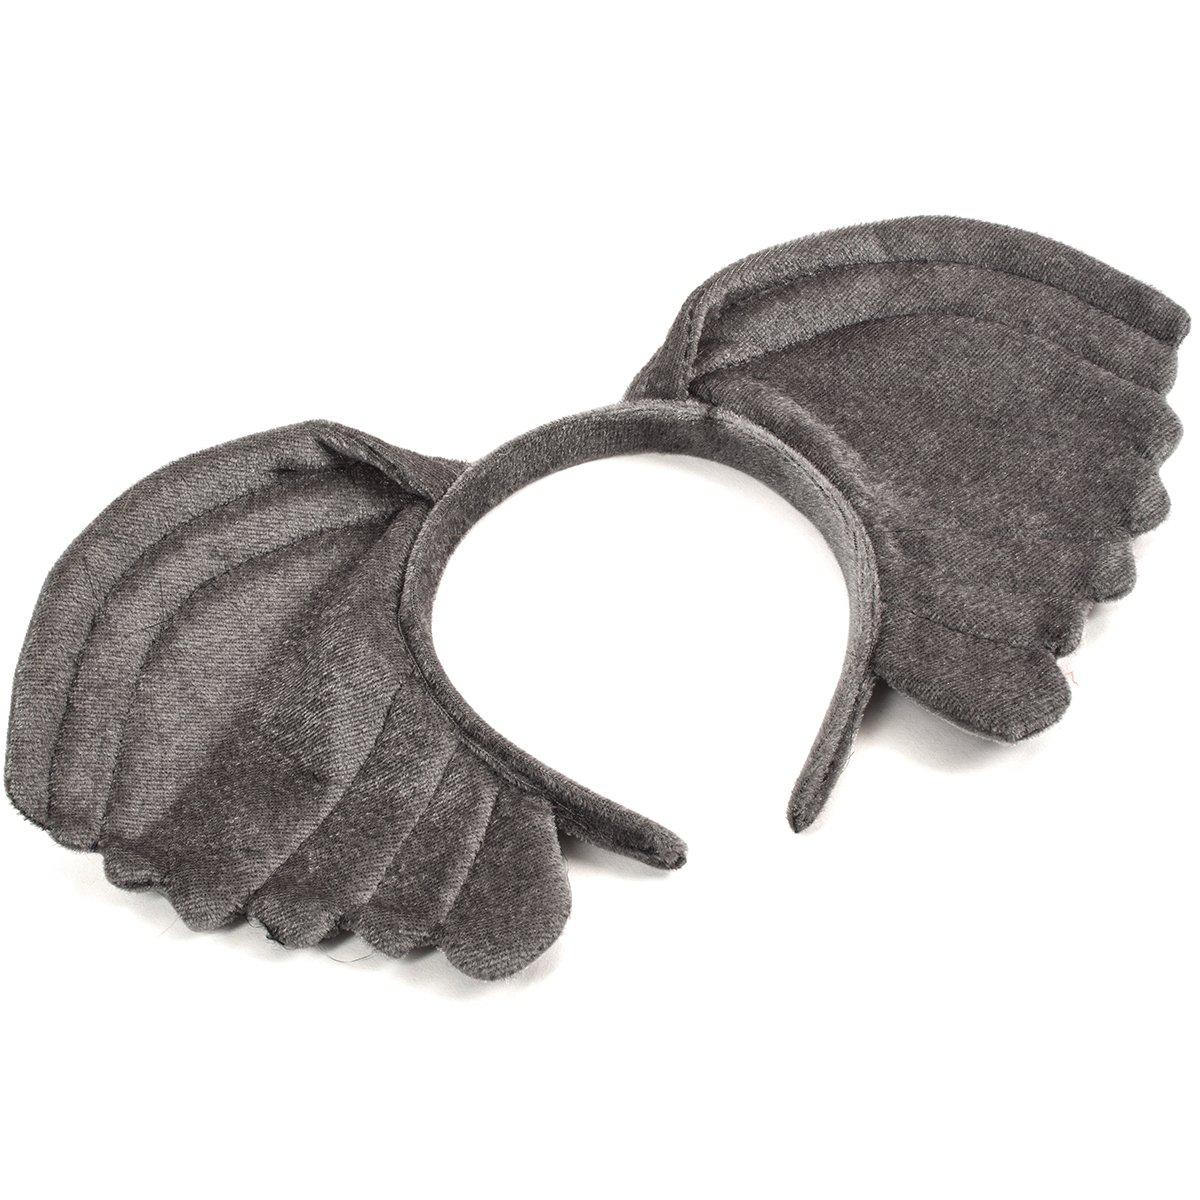 Funny Party Hats Lion Ears and Tail Set - Lion Costume - Ears Headband -  Animal 4cd97b19e2ed